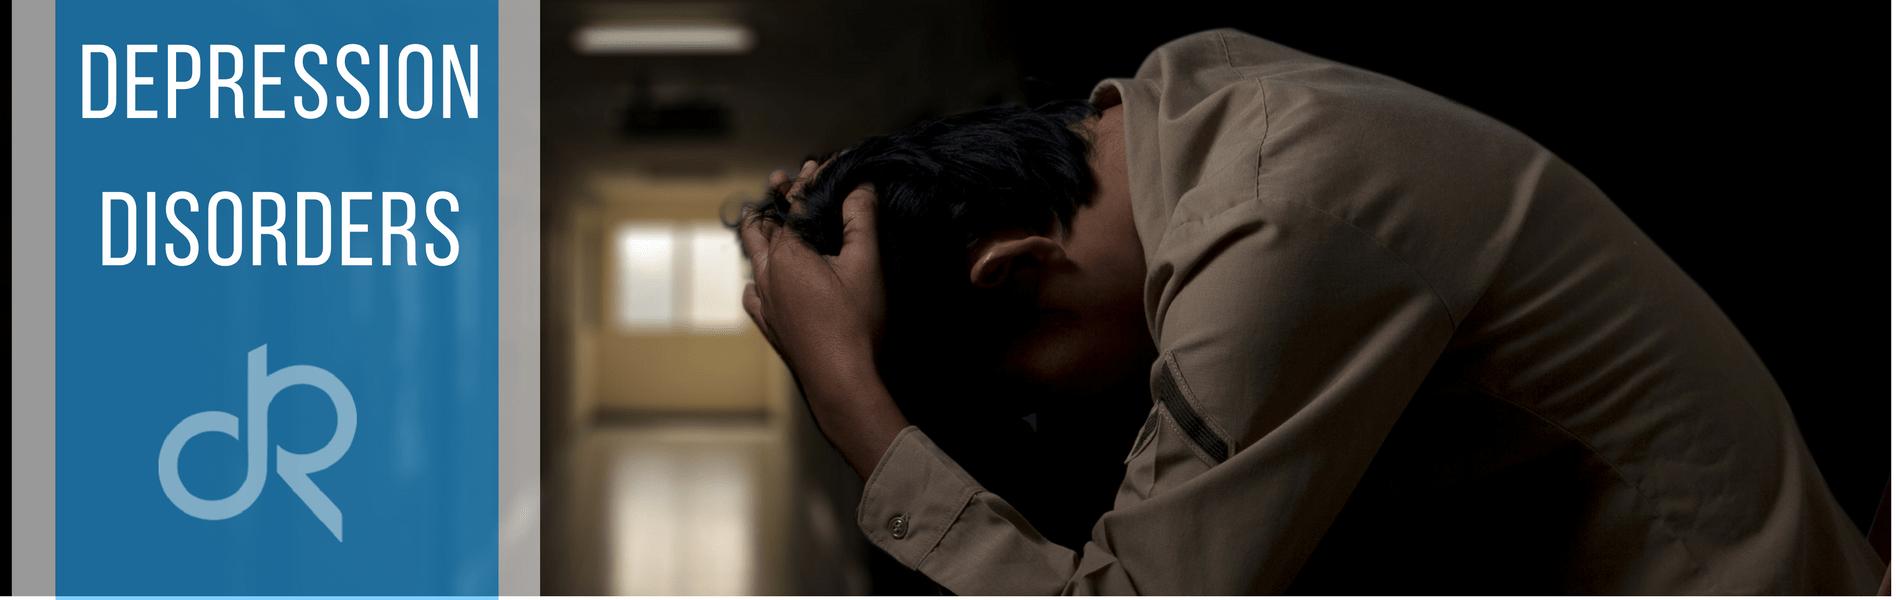 depression disorders